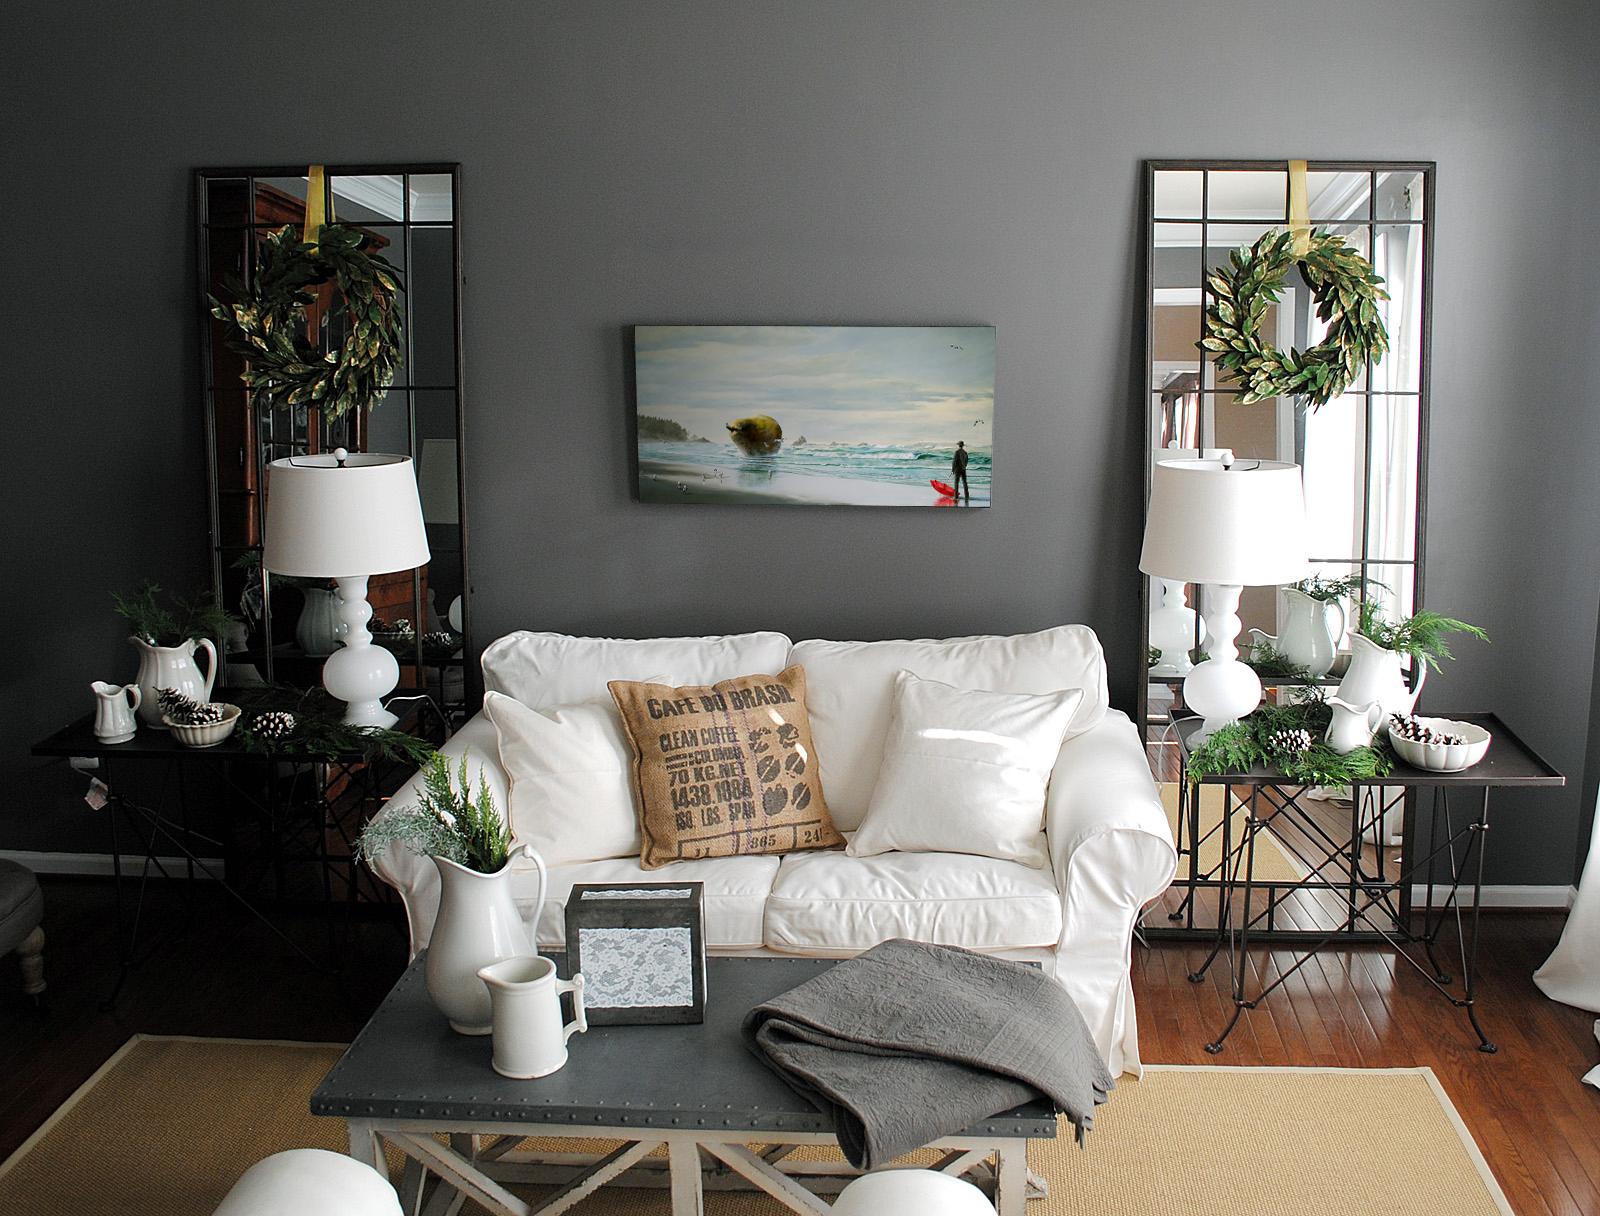 interior-design-artwork-on-wallinterior-design-artwork-on-wall-first-contact-bill-higginson.jpg